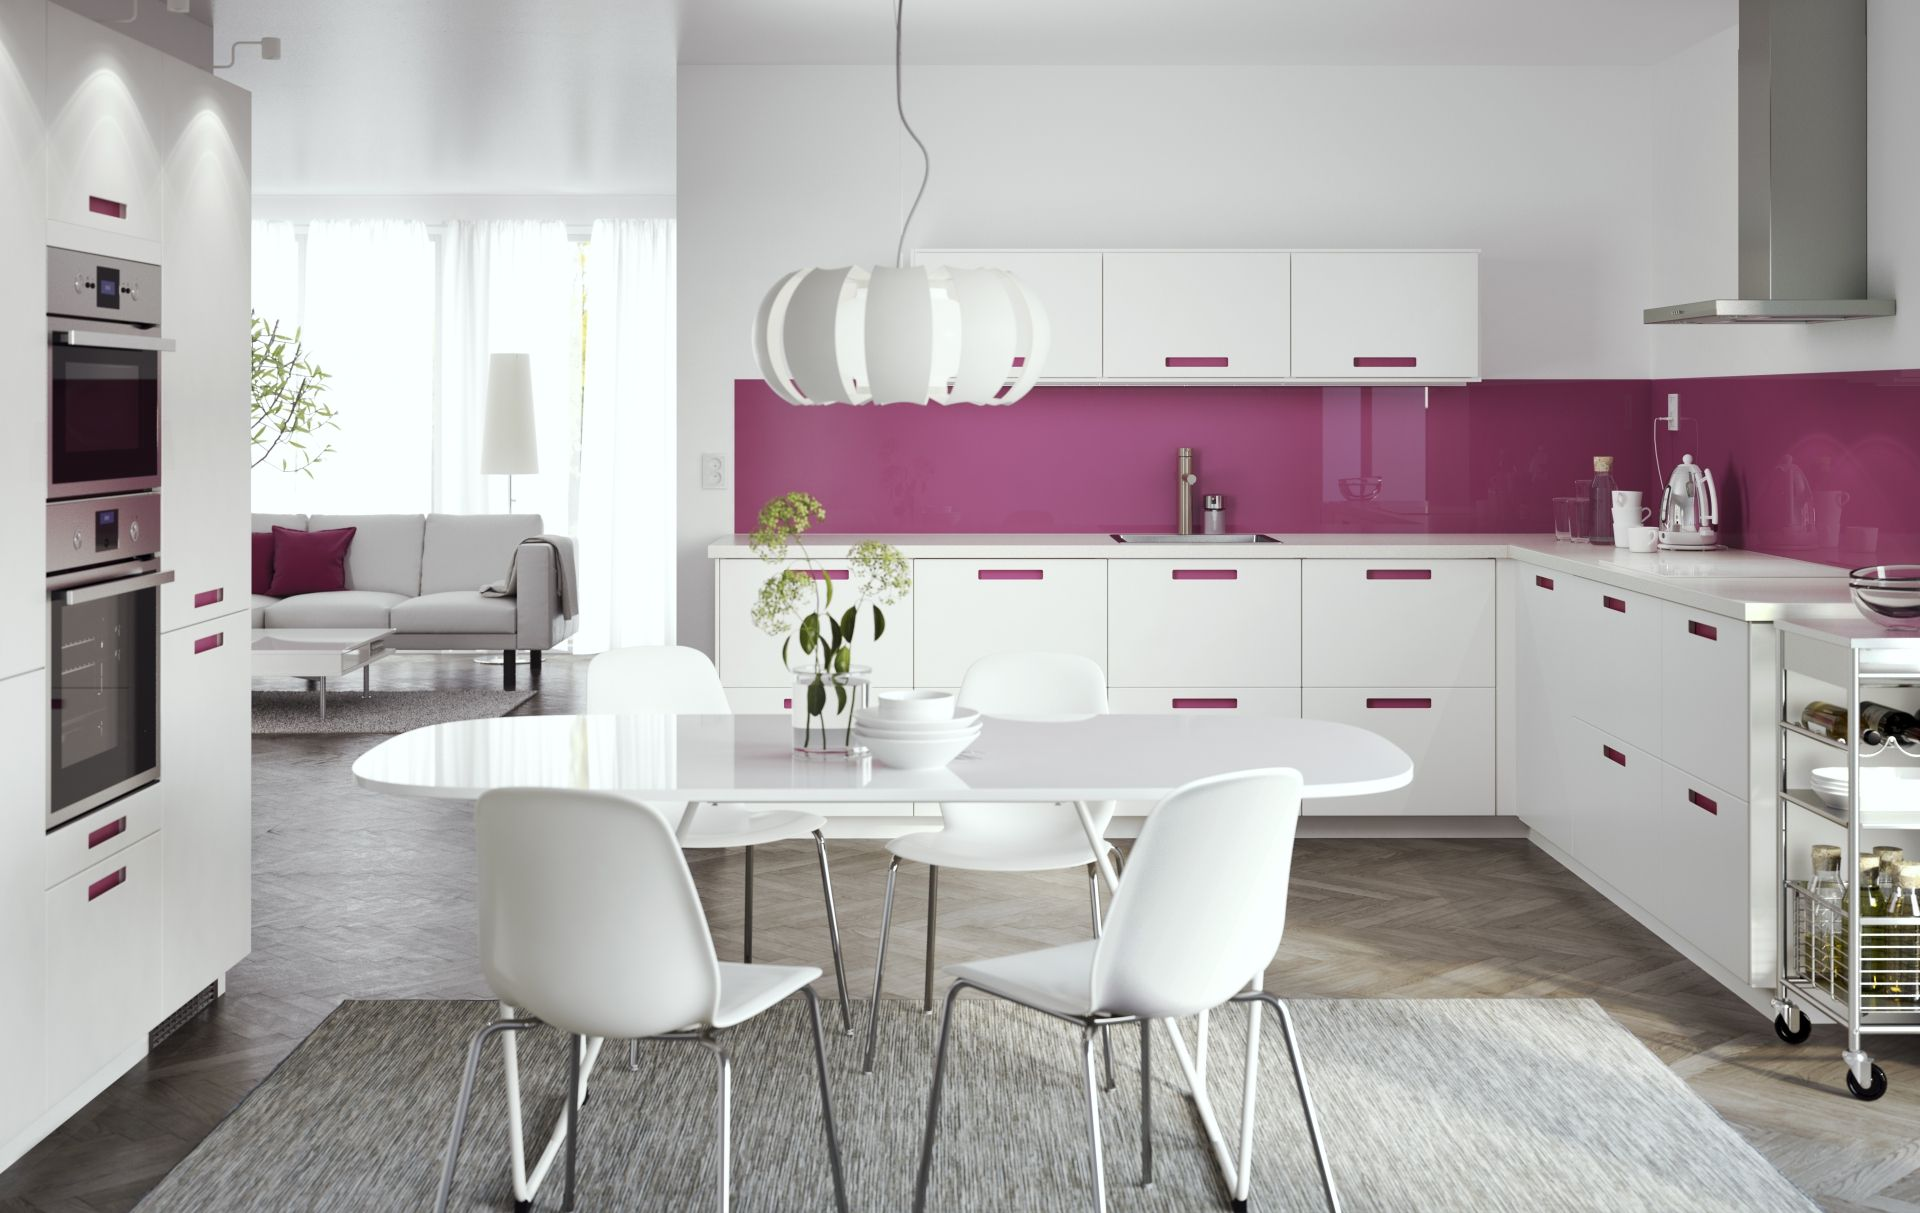 Opbergers Ikea Keuken : Metod mÄrsta keuken ikea ikeanl ikeanederland veelzijdig fronten